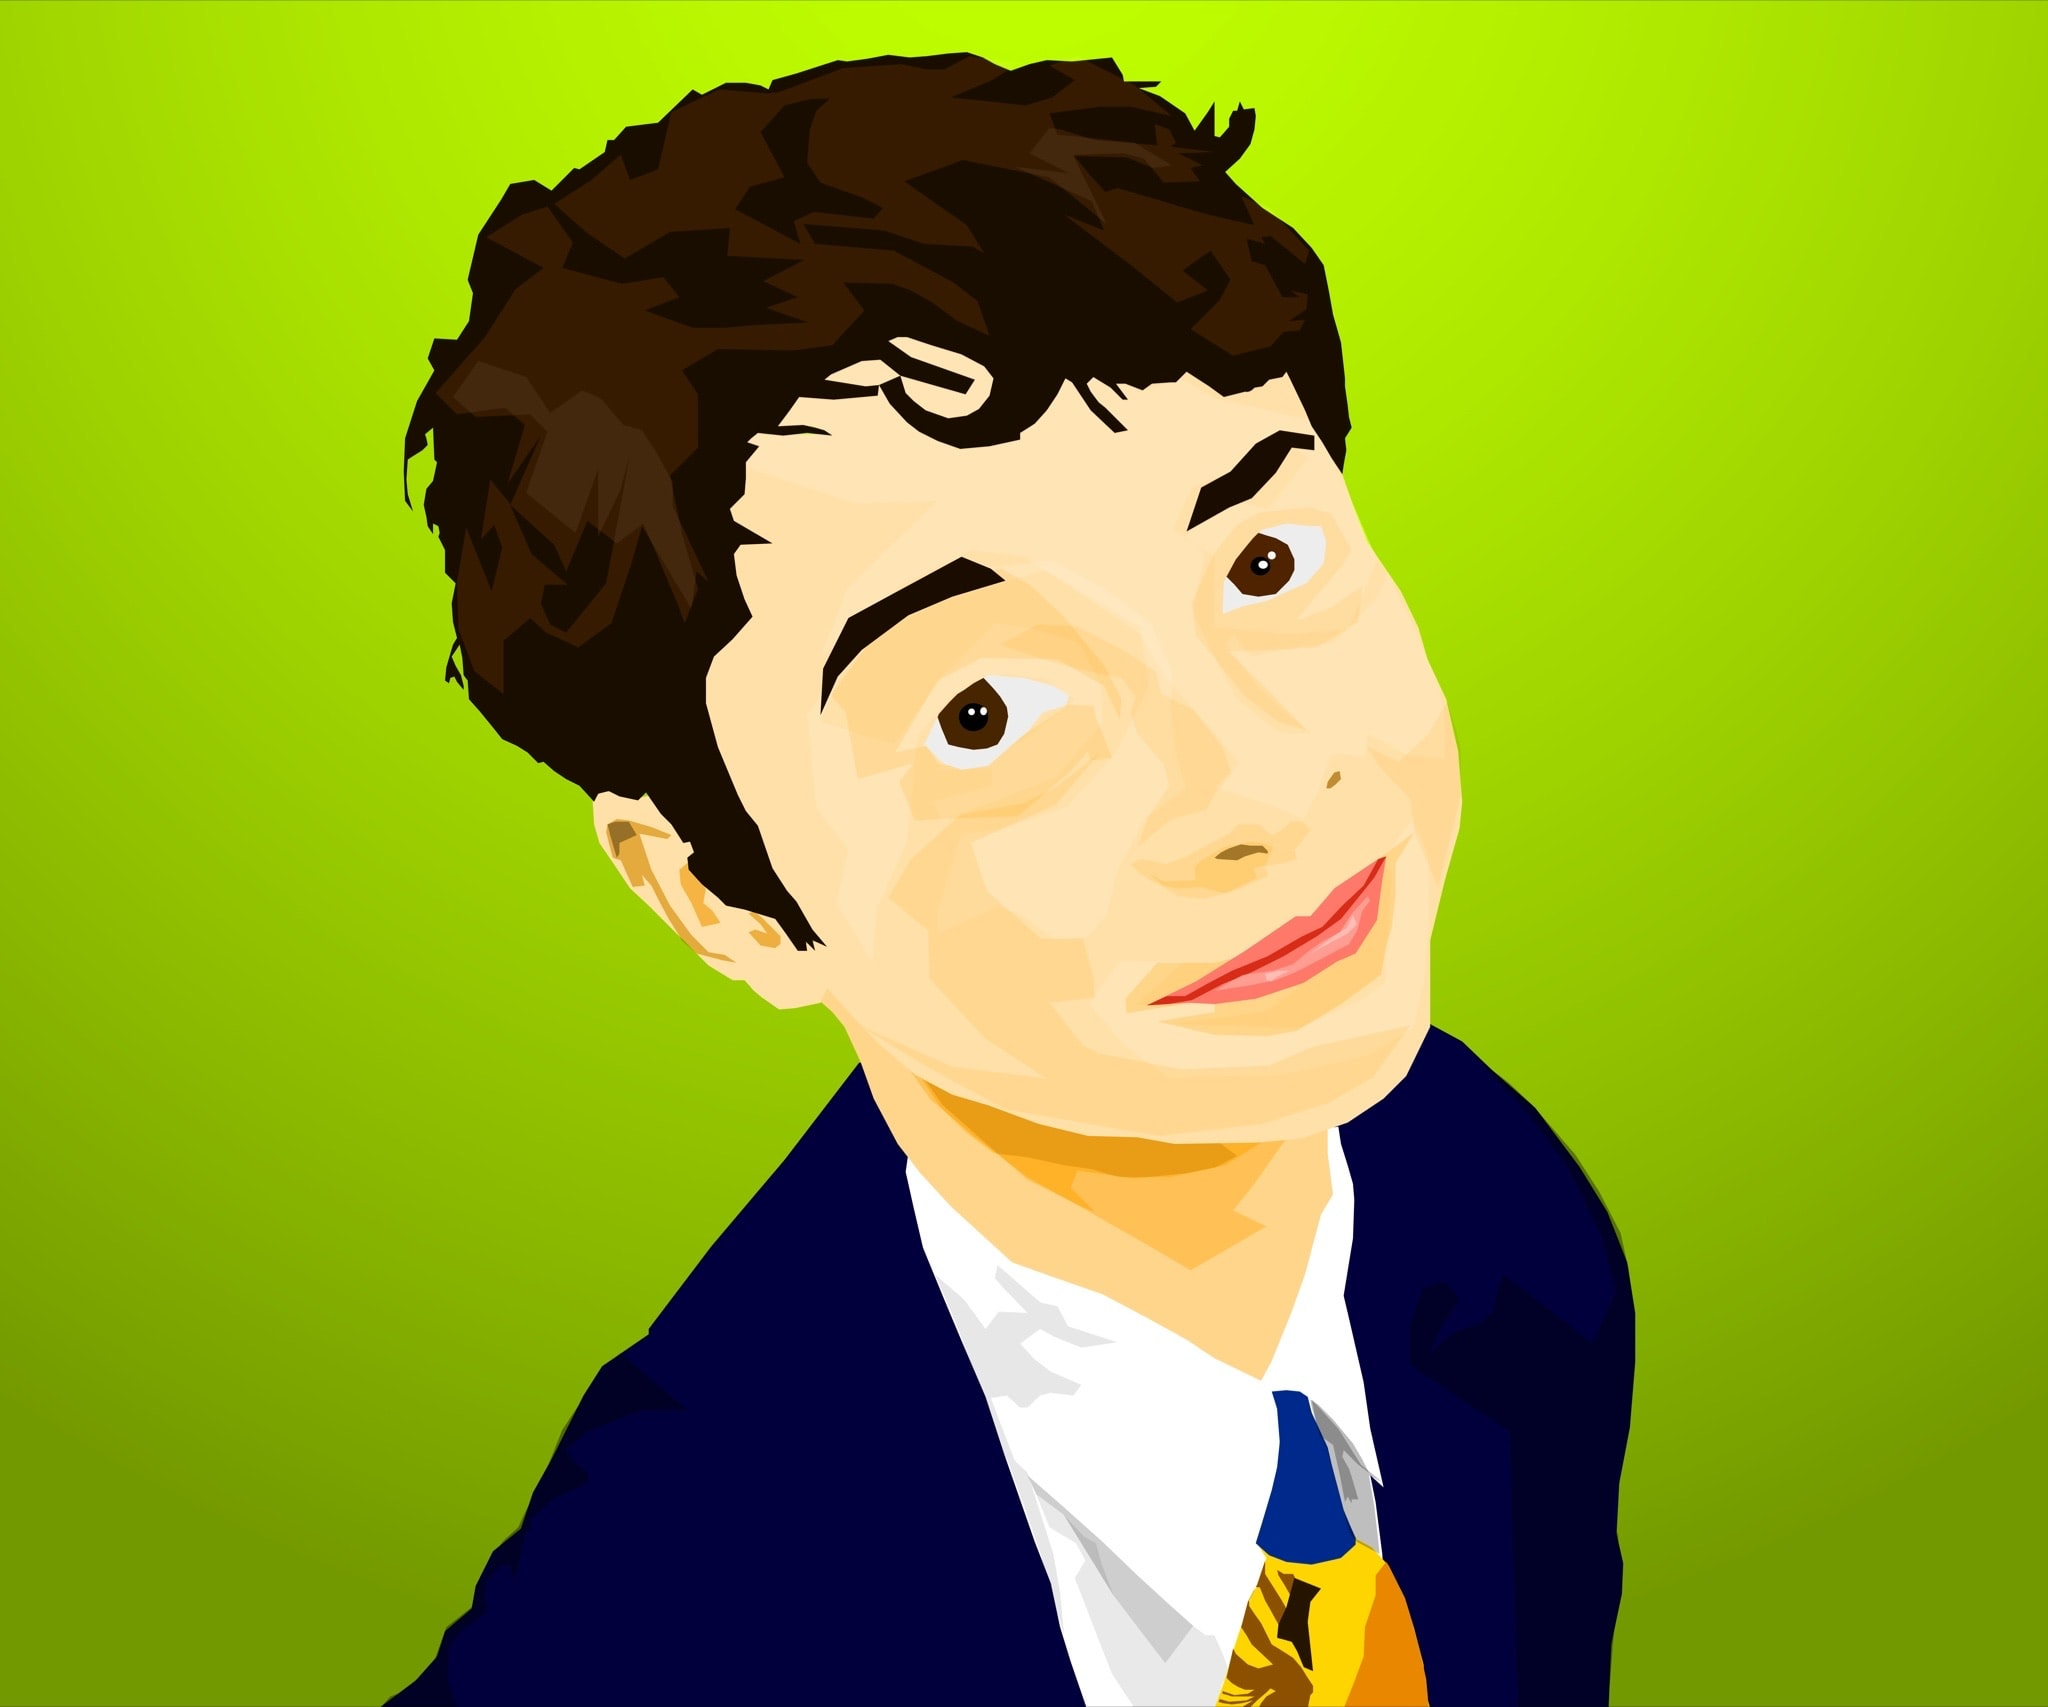 Go to Sam S's profile